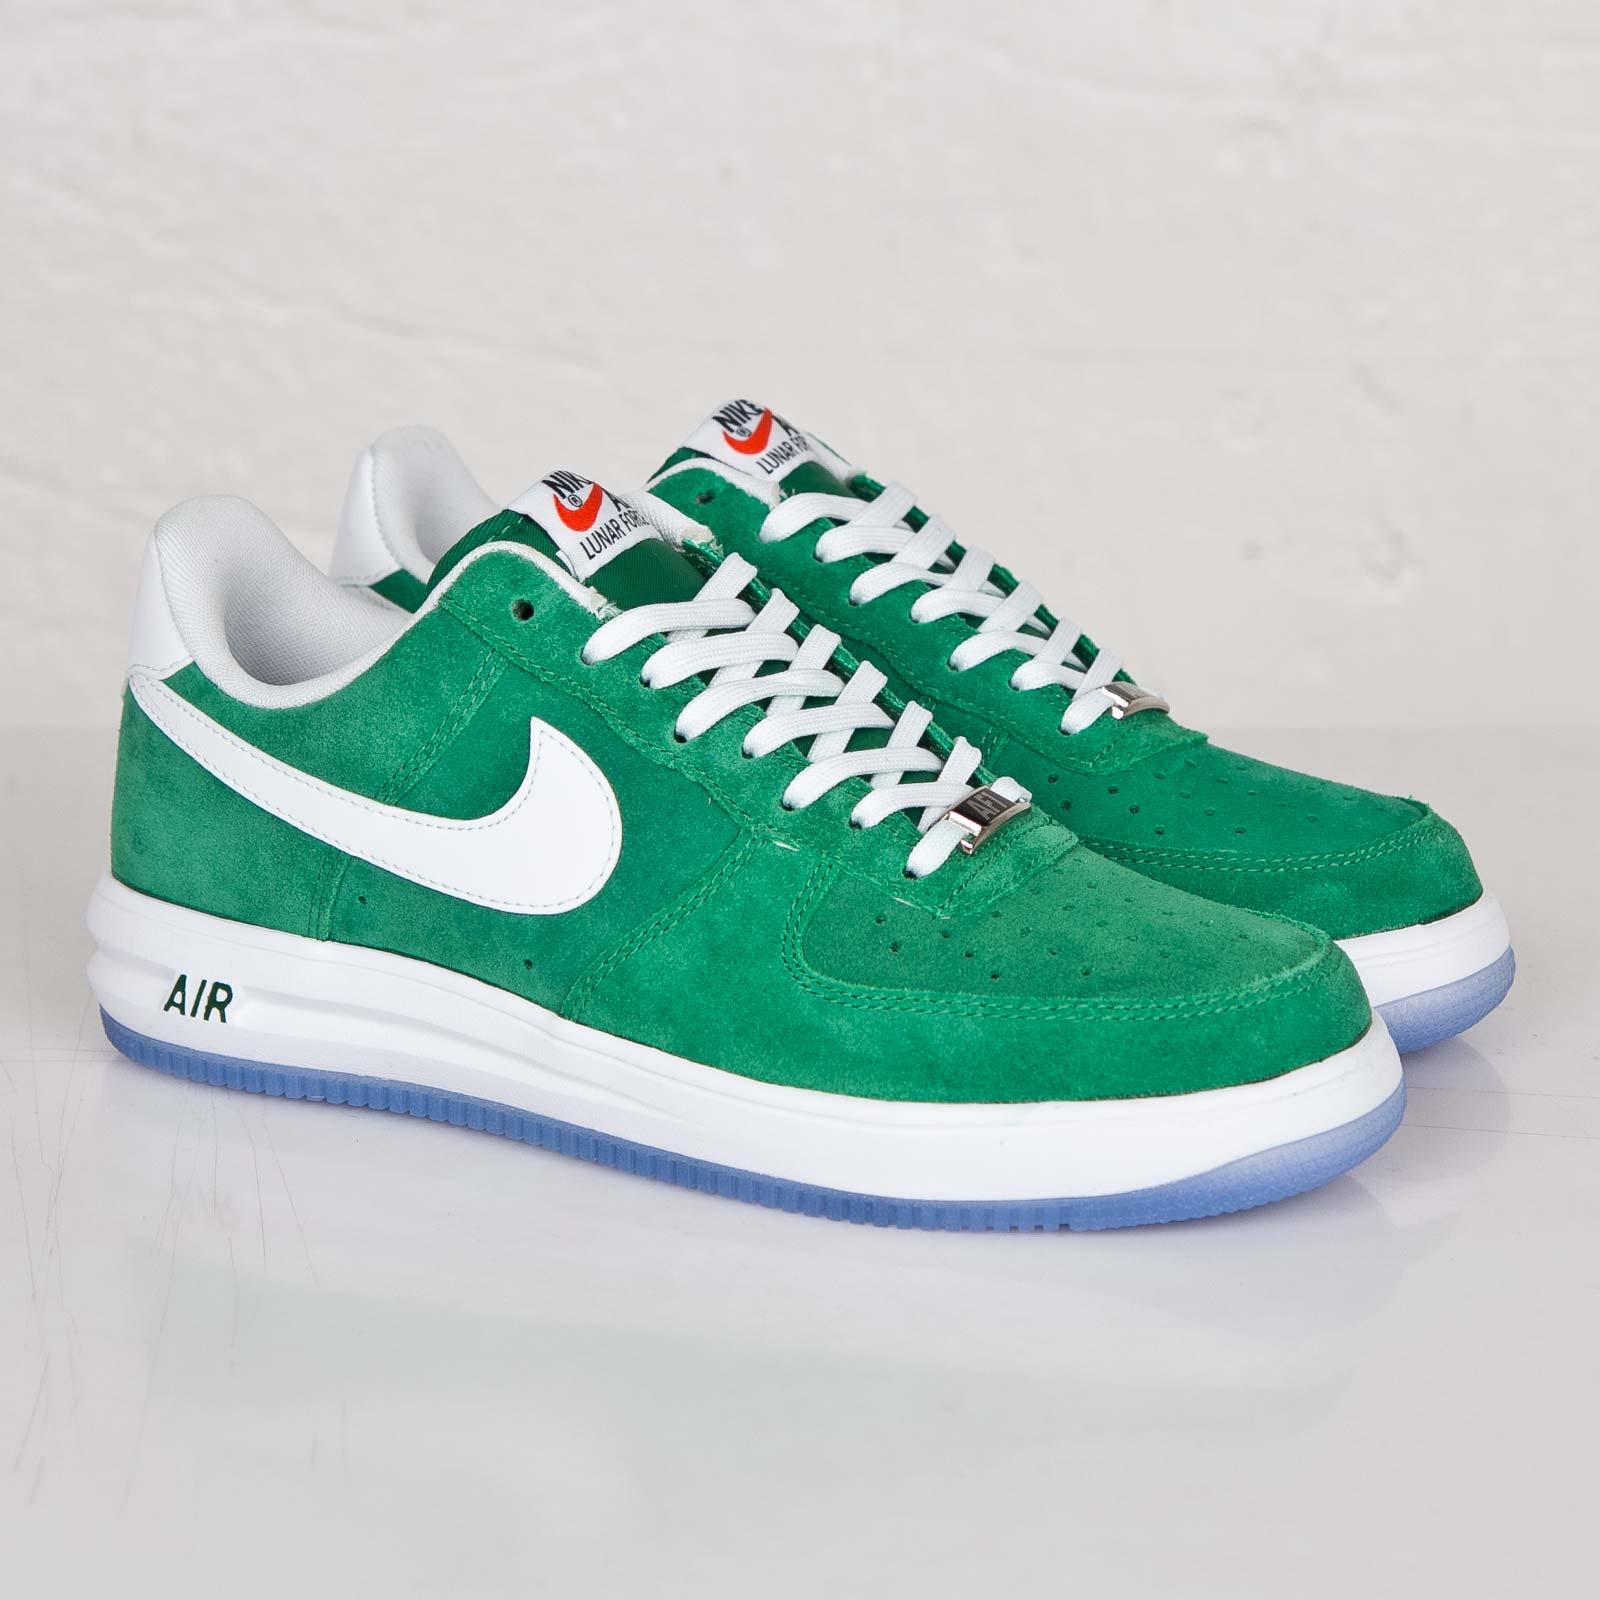 best service ea426 24515 Nike Lunar Force 1 14